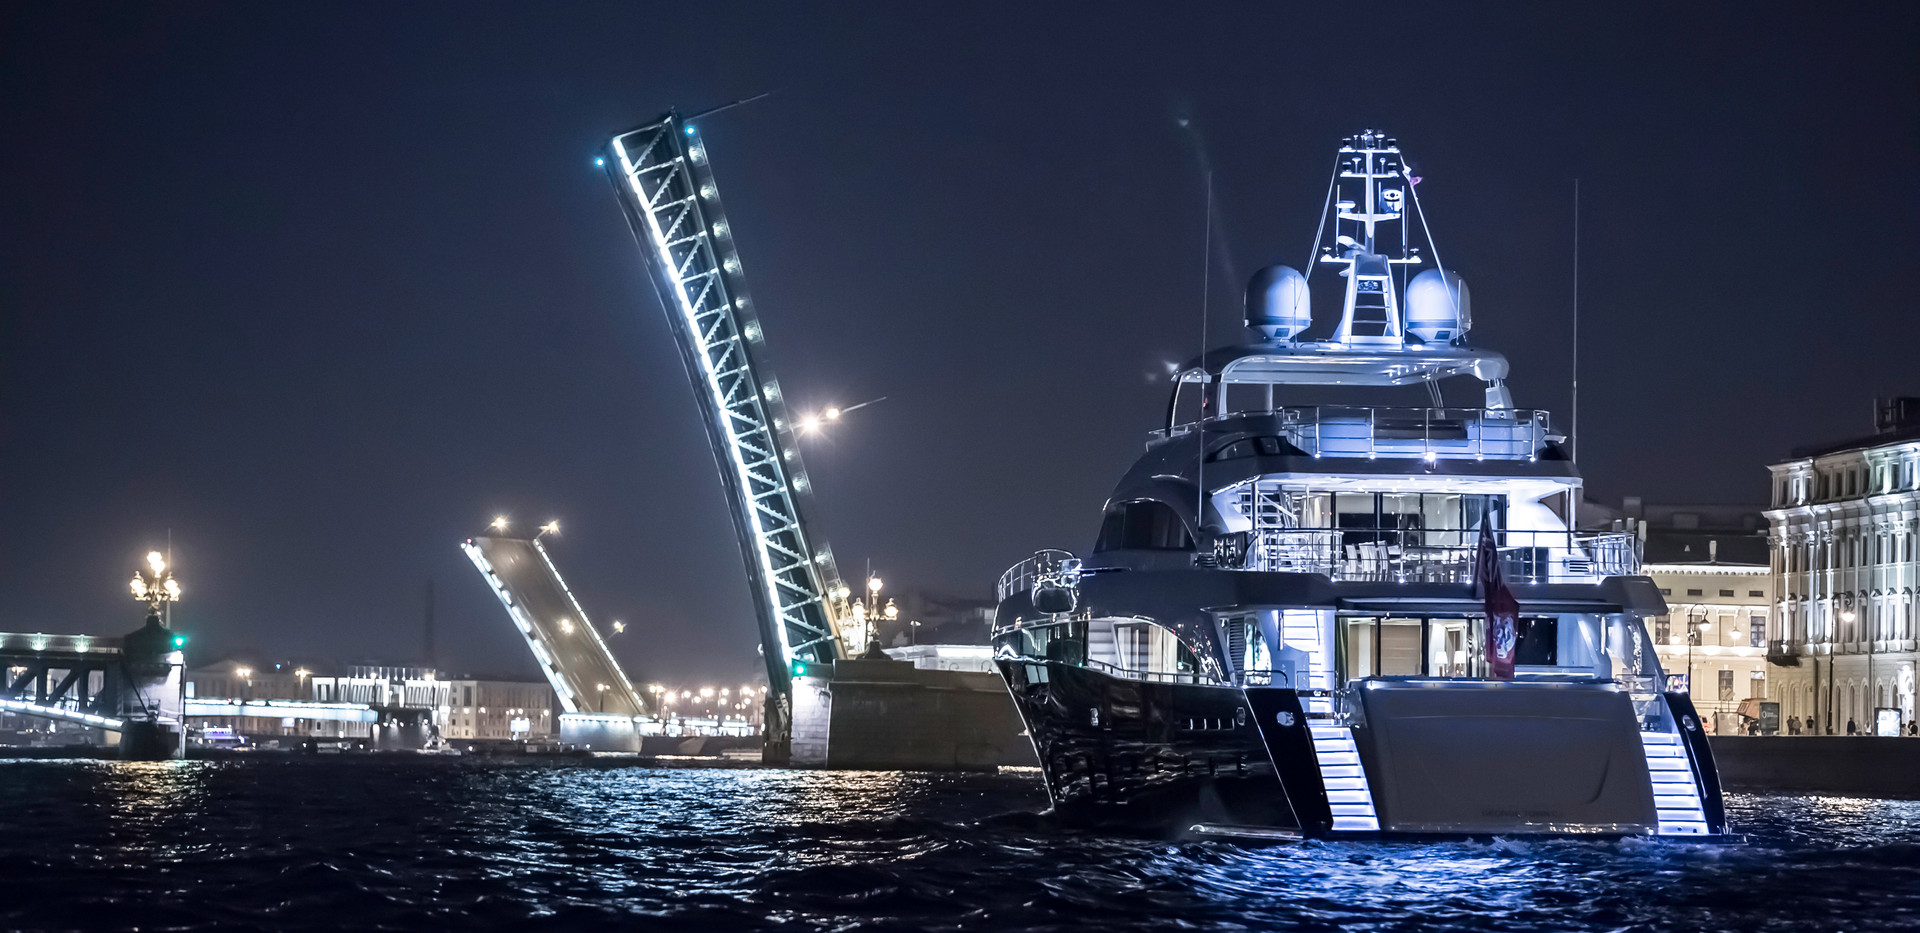 40m-exterior-blue-hull-flying-fish-3Abro